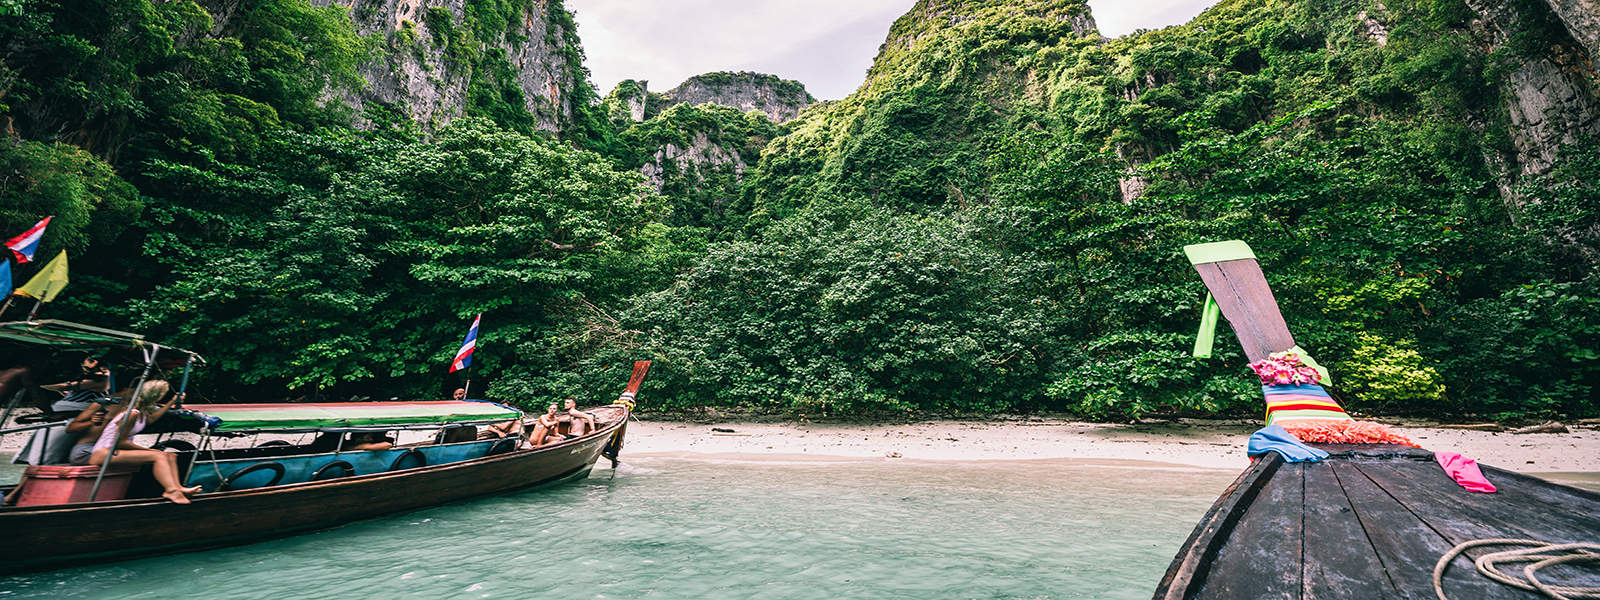 عرض سياحي 5 أيام في تايلاند